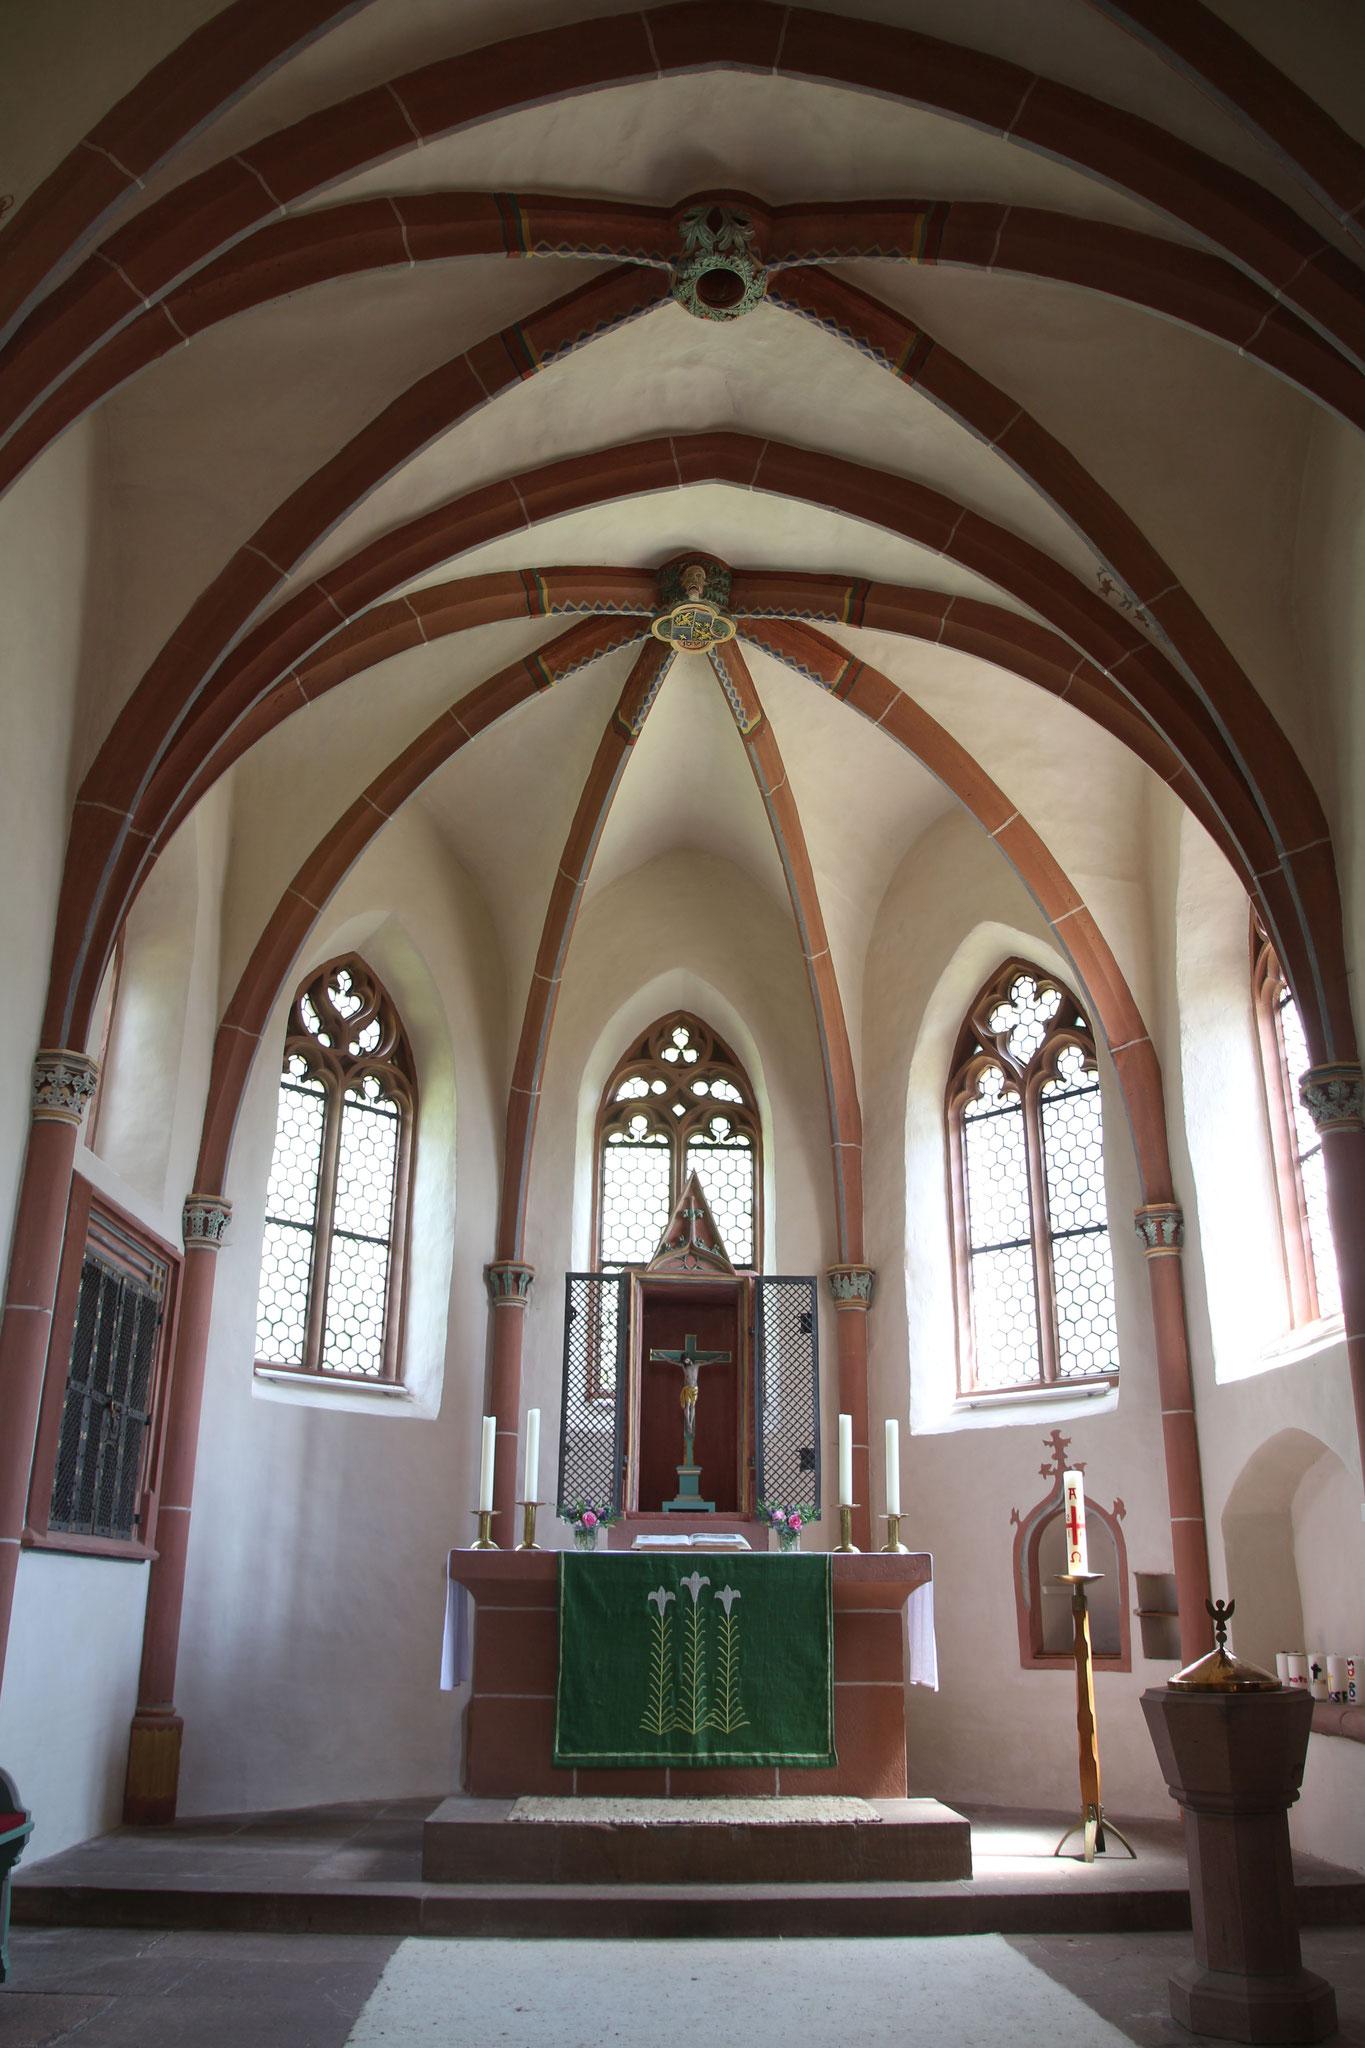 Marienkirche Wehrshausen   Bildquelle: Gerold Rosenberg bei Wikipedia